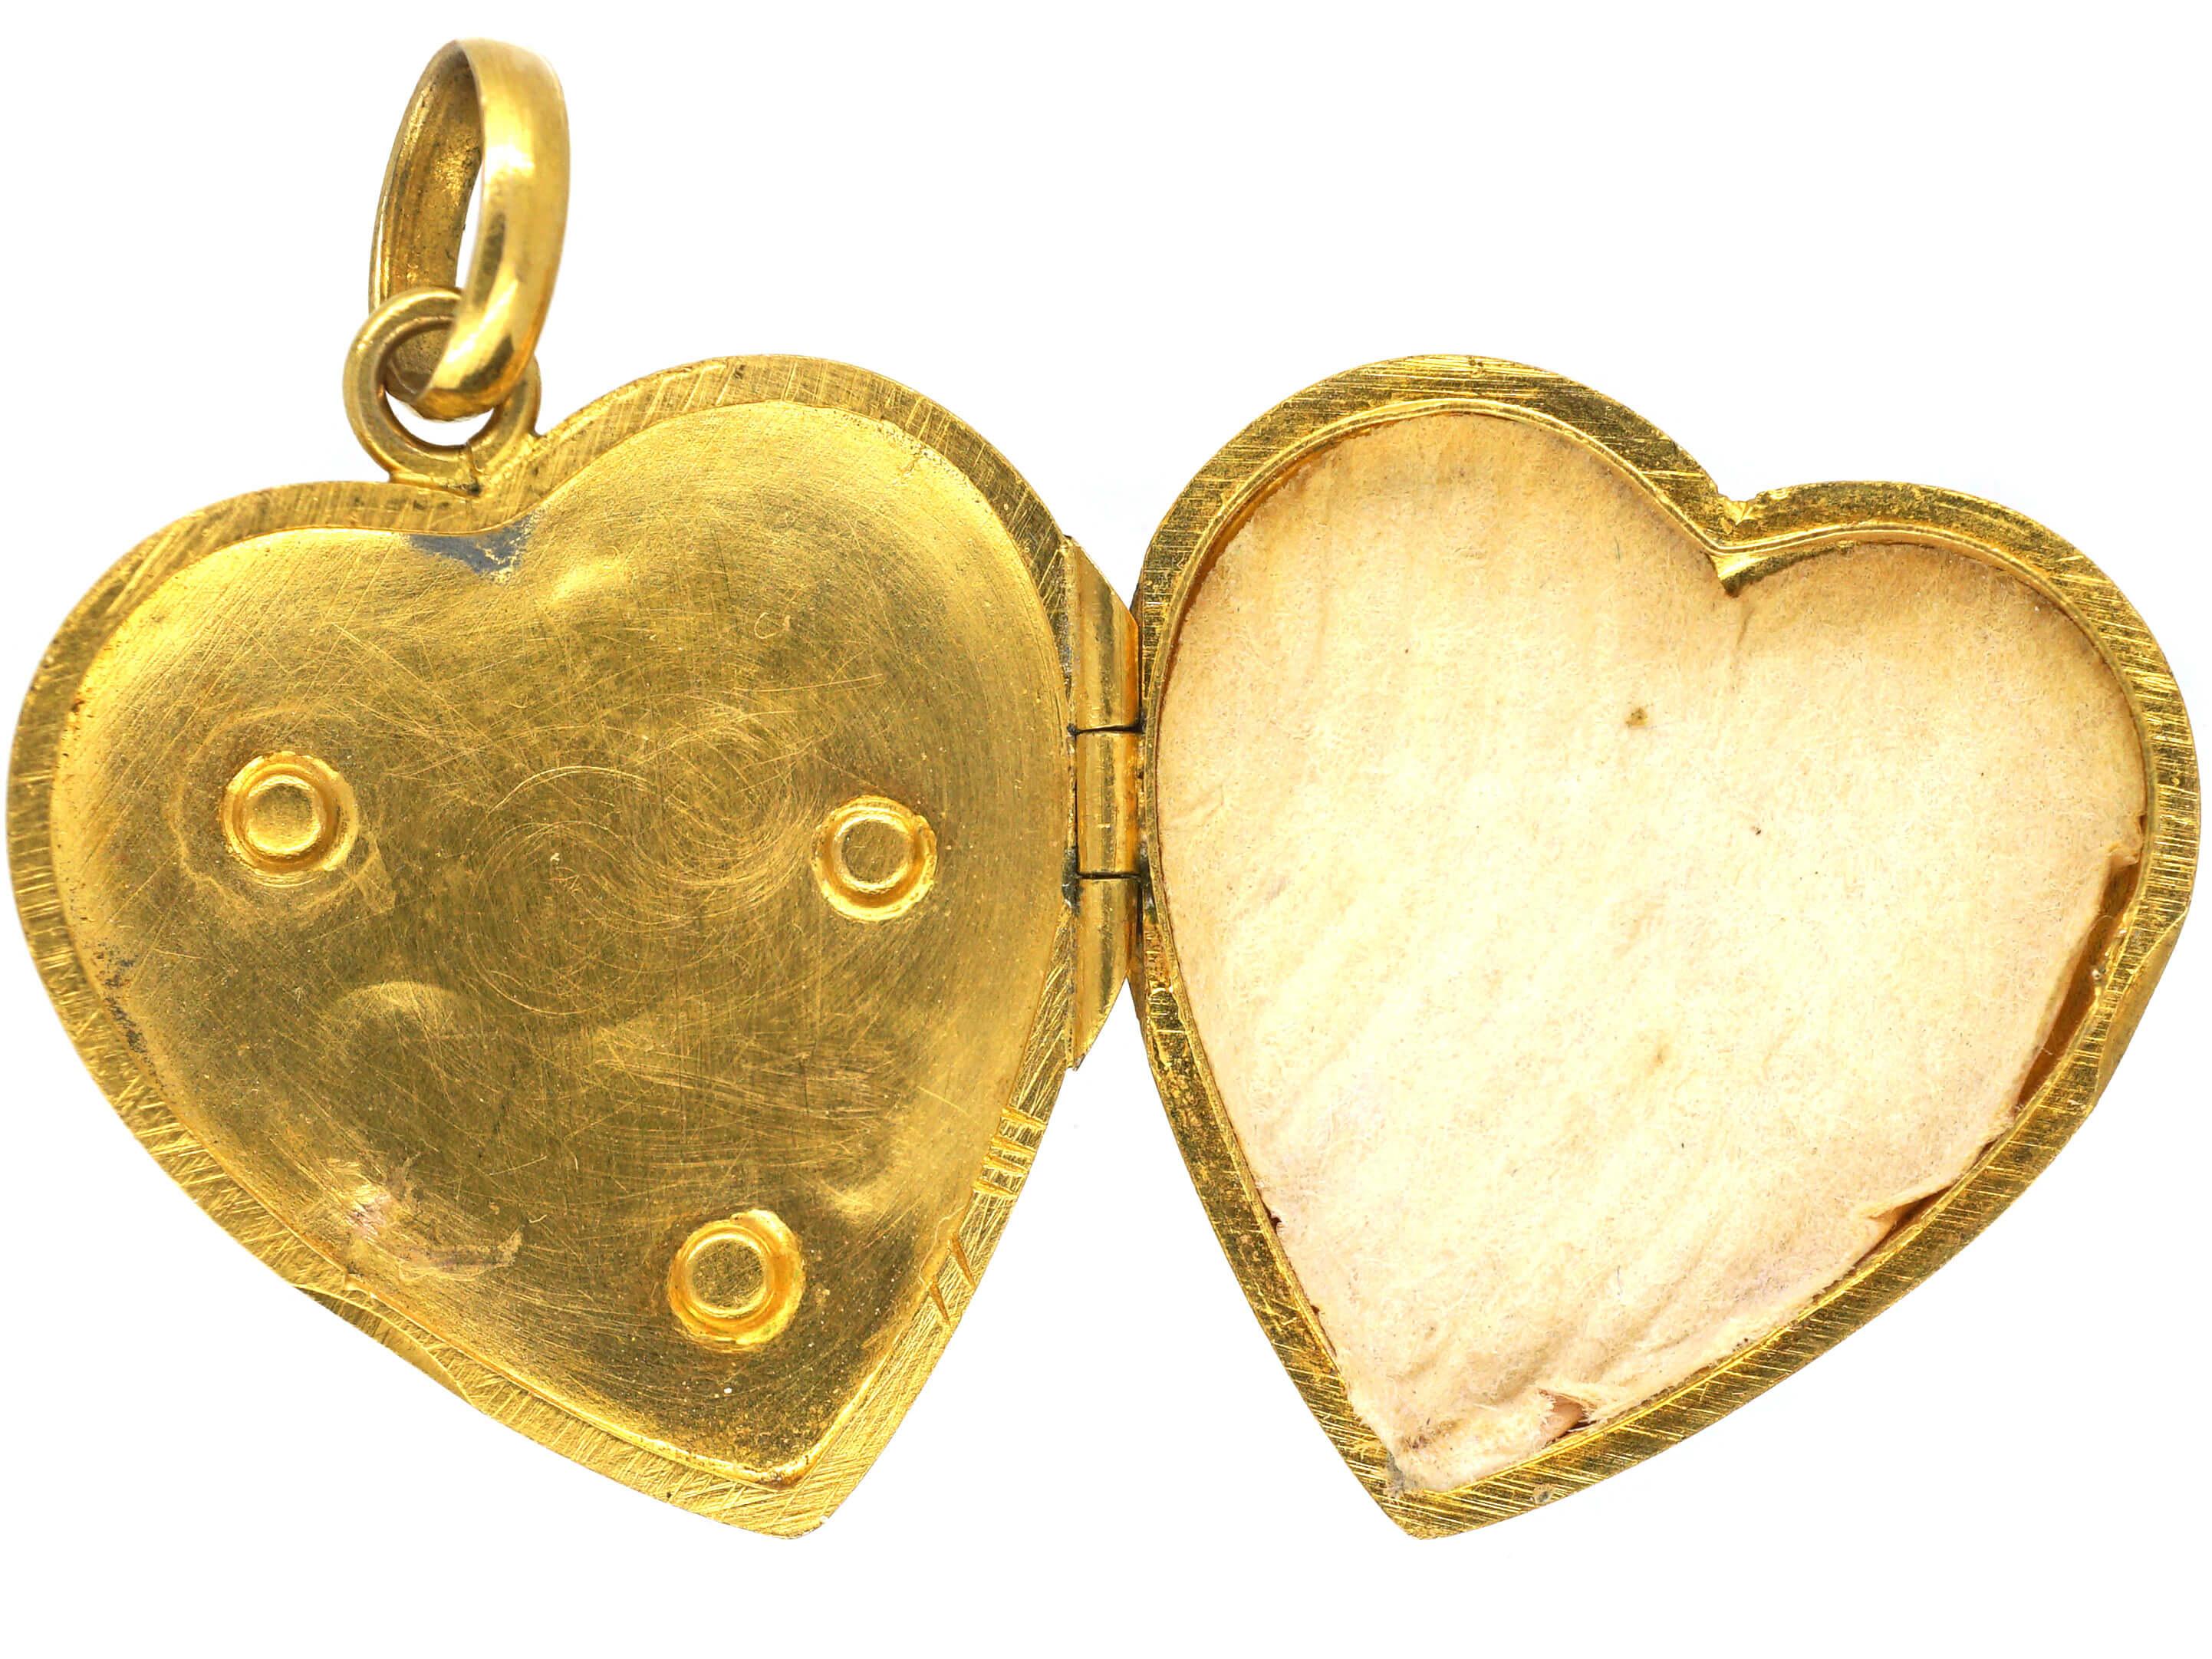 Art Nouveau 18ct Two Colour Gold Heart Shaped Mistletoe Motif Locket set with Three Natural Split Pearls